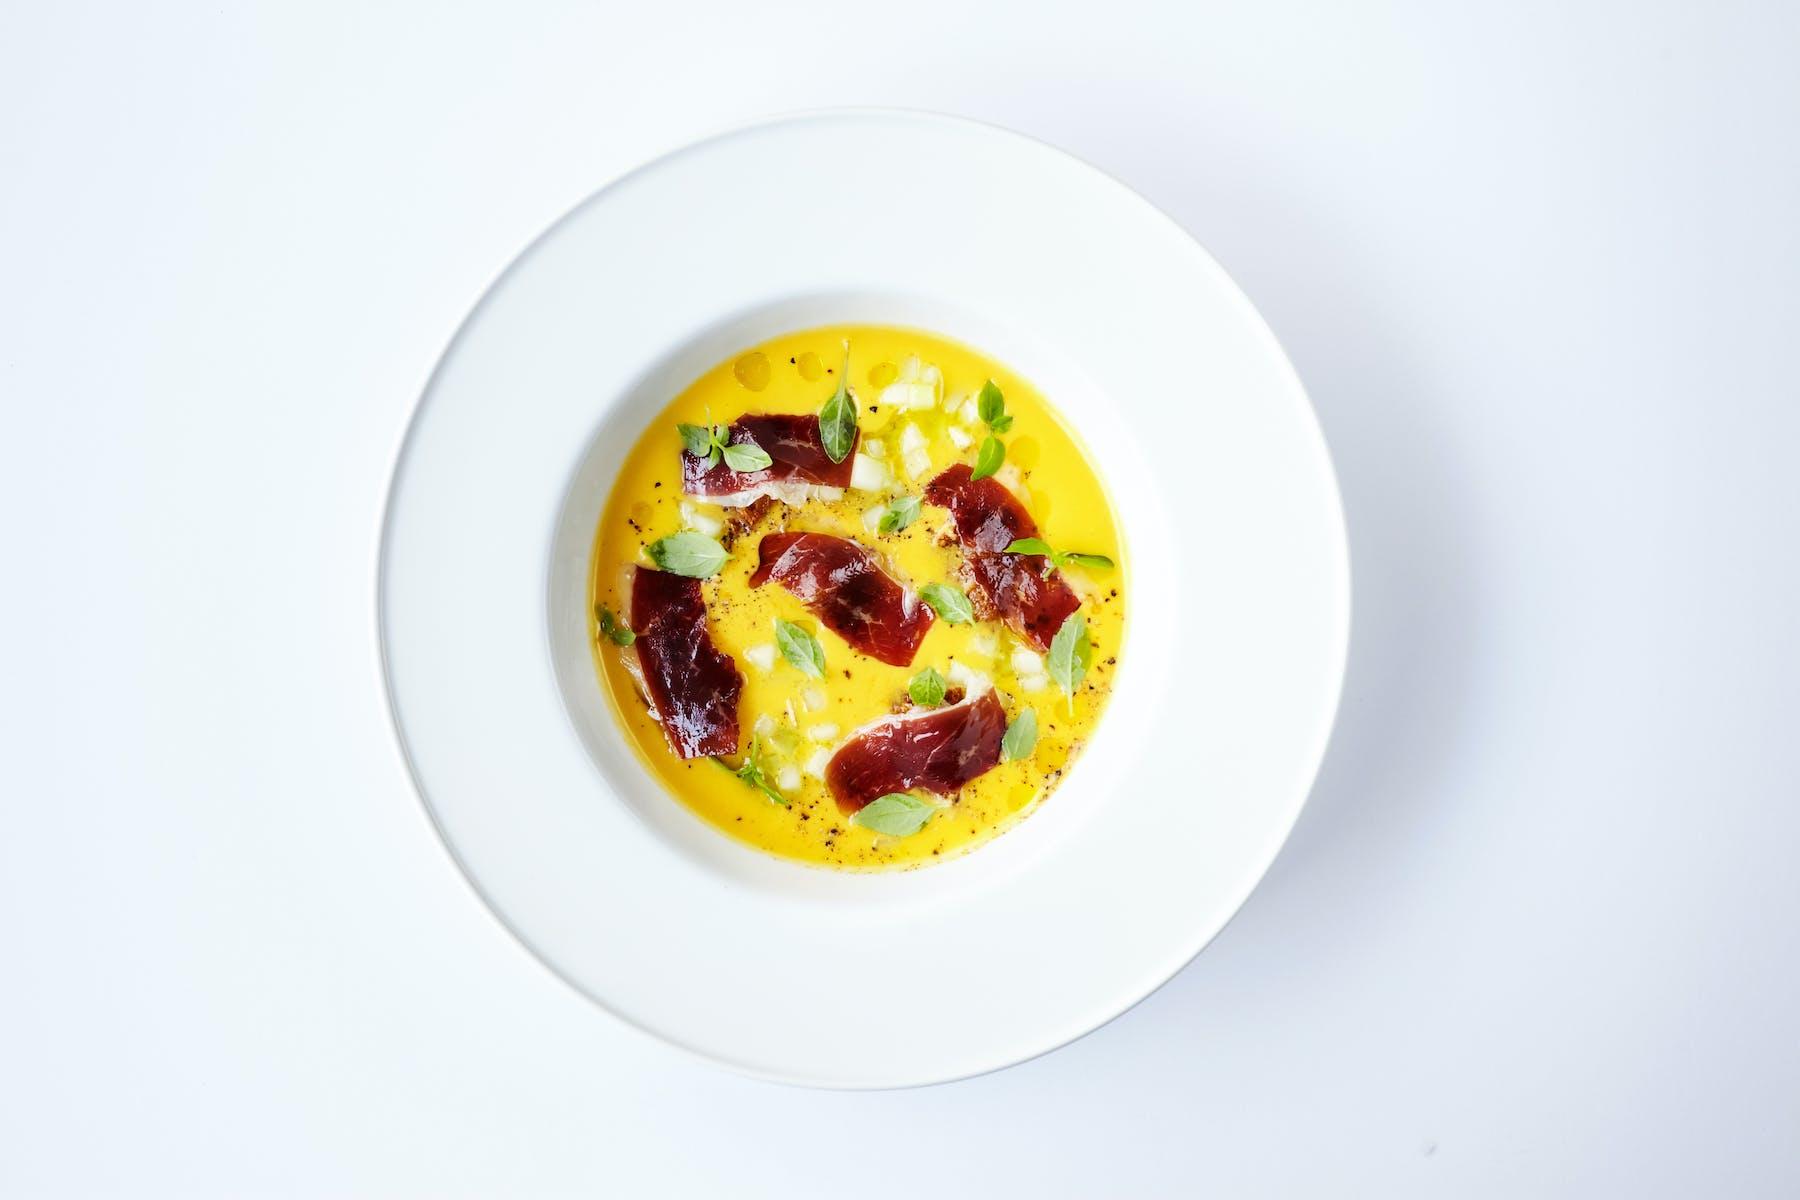 a yellow soup dish